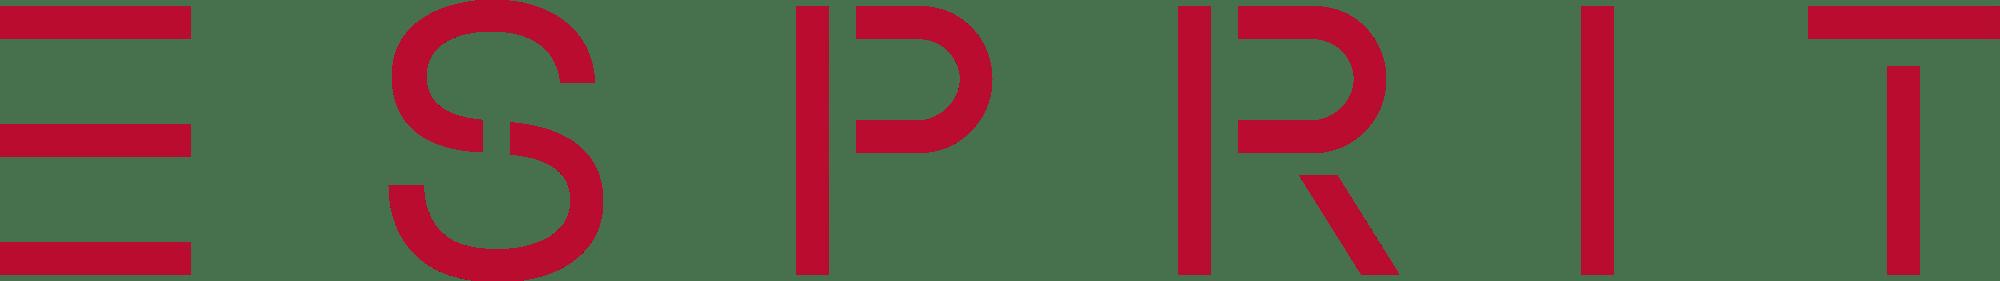 Esprit Logo Red.PNG.